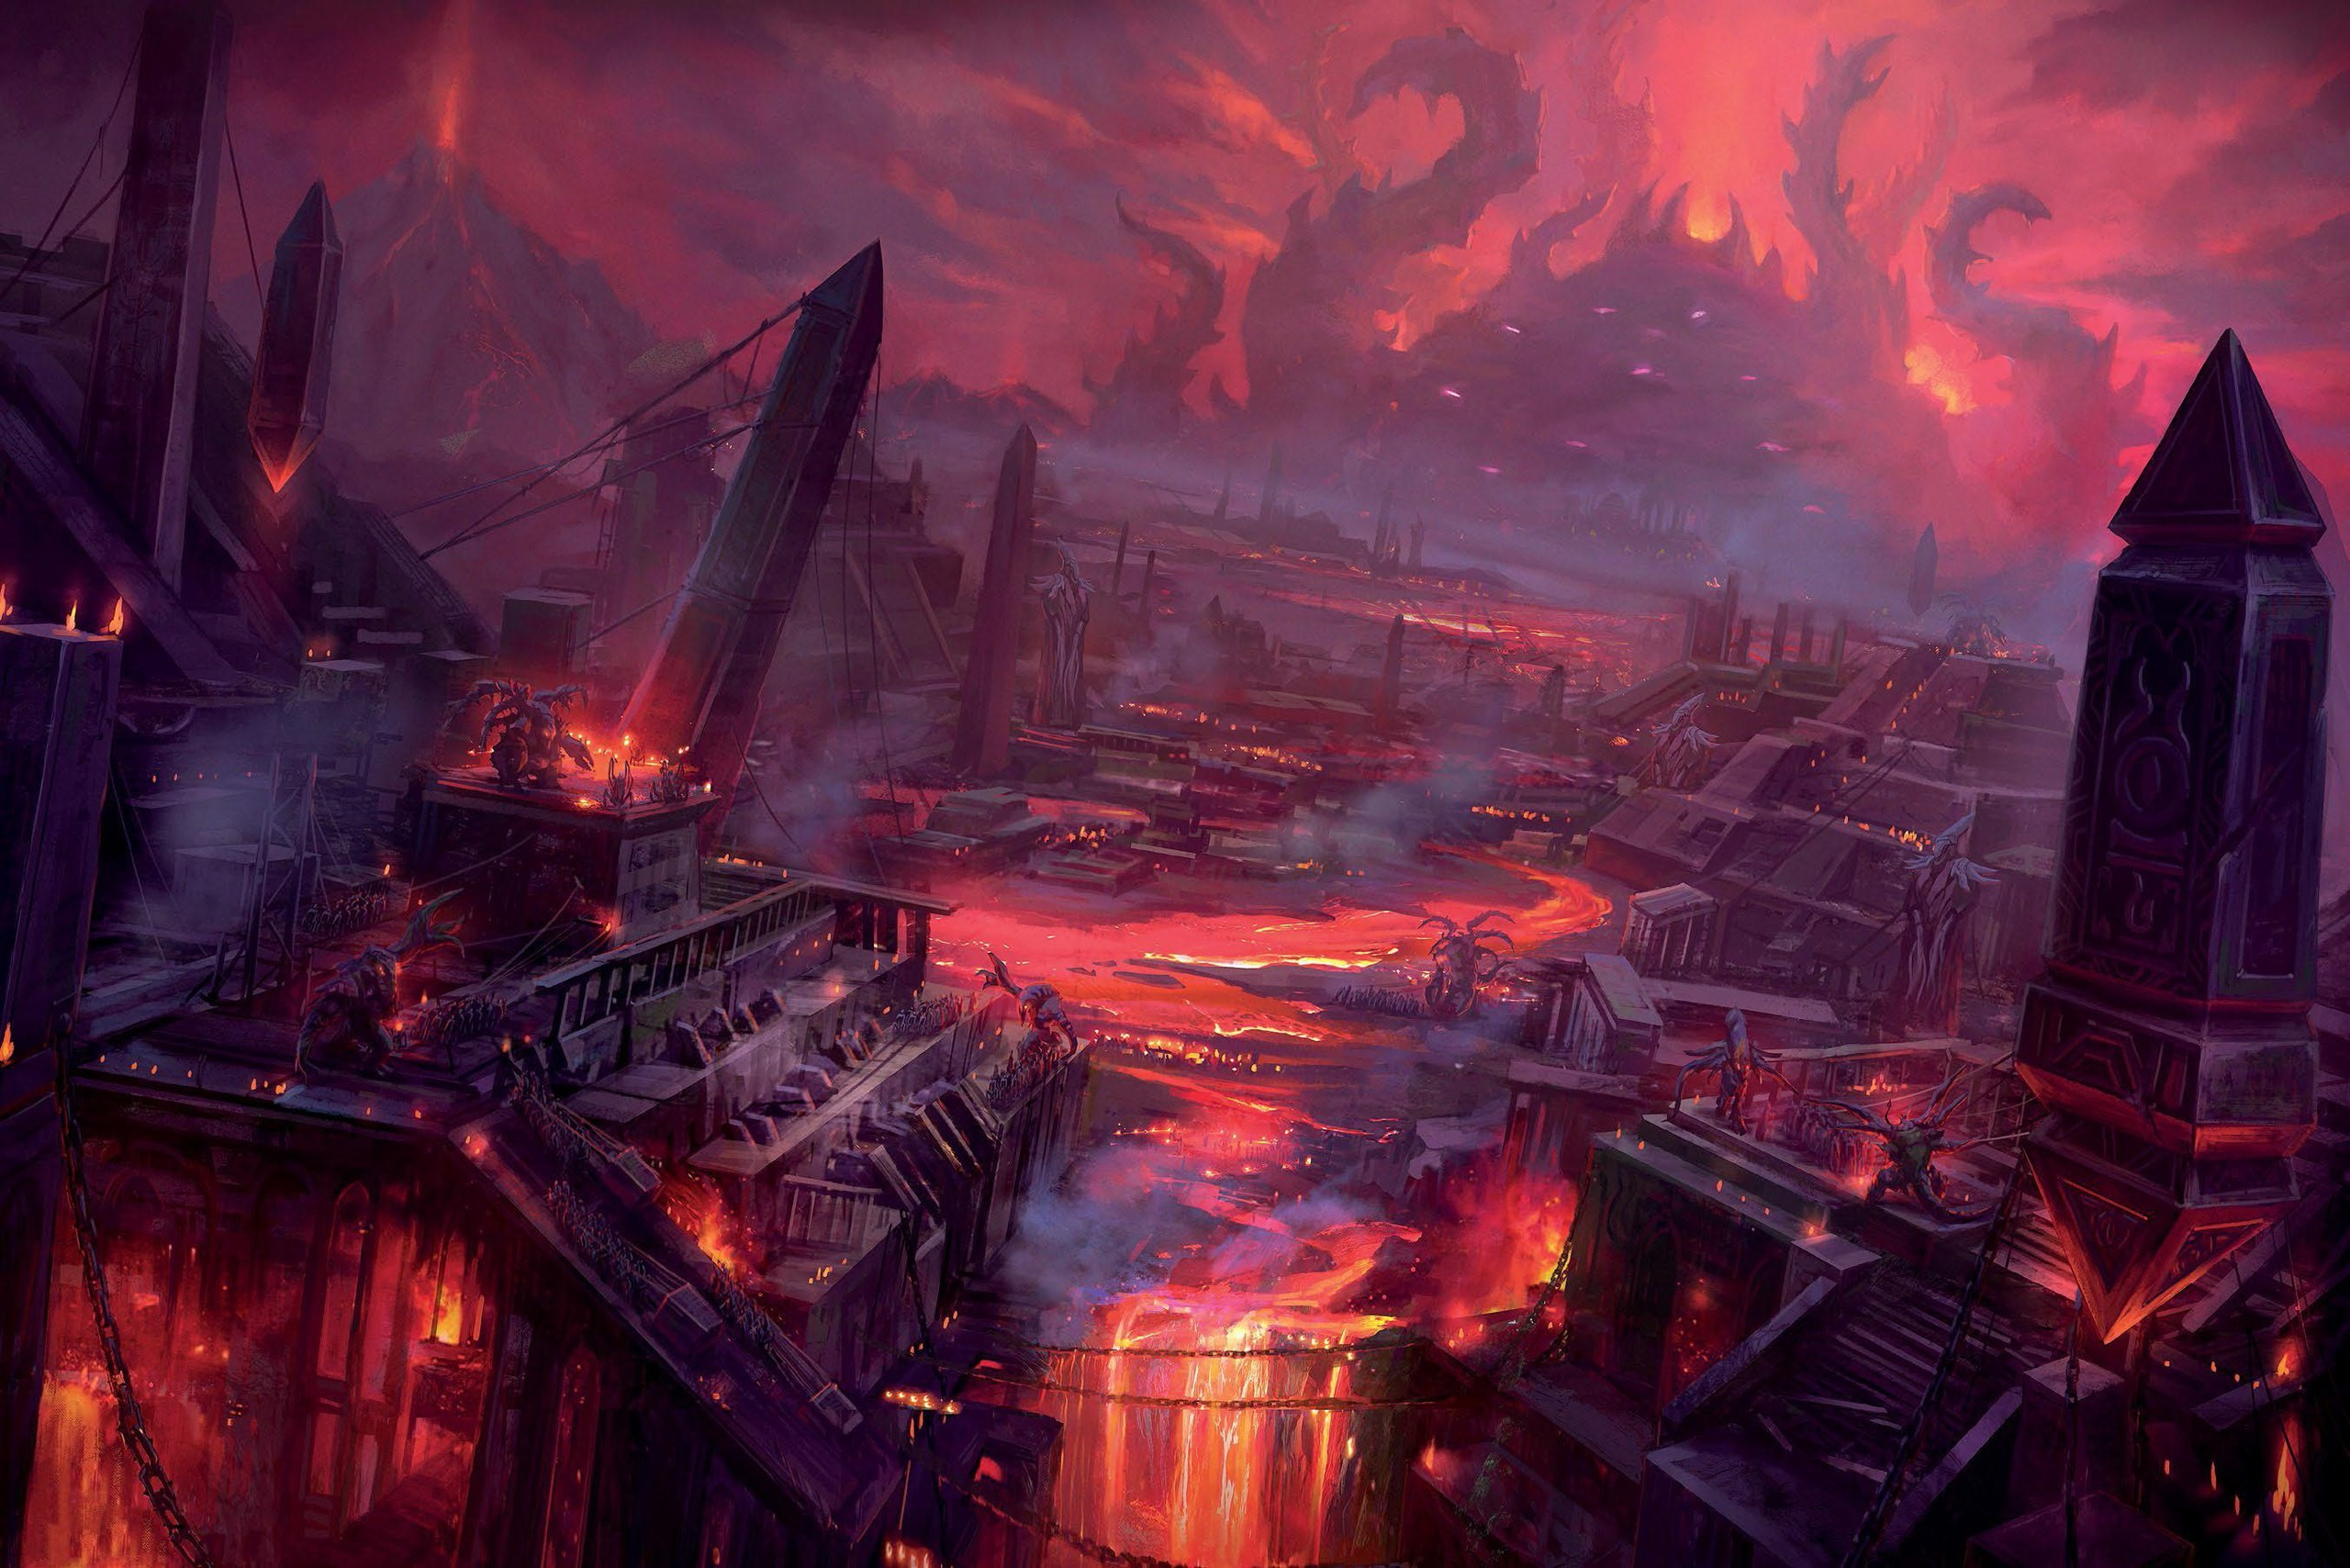 World of Warcraft Desktop Wallpapers